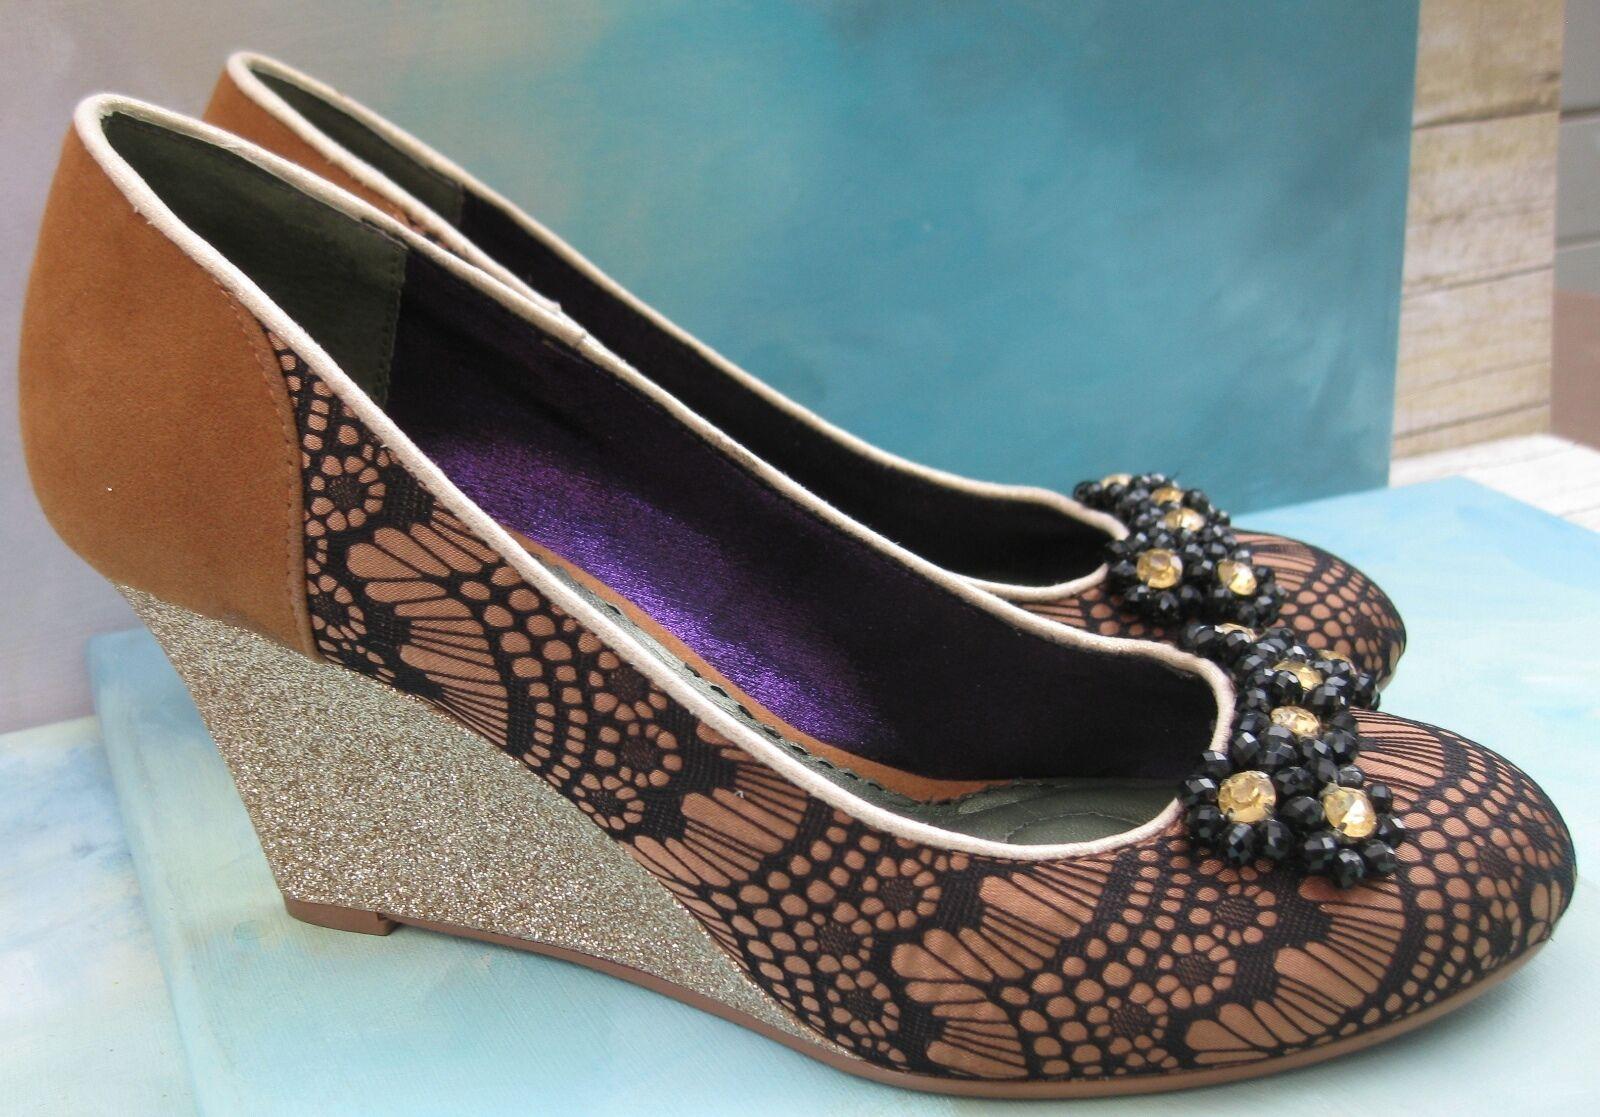 Poetic Licence golden Glitter Wedge Black Black Black Lacy Pumps Heels Wms EU 39 US 8.5 8f7a66